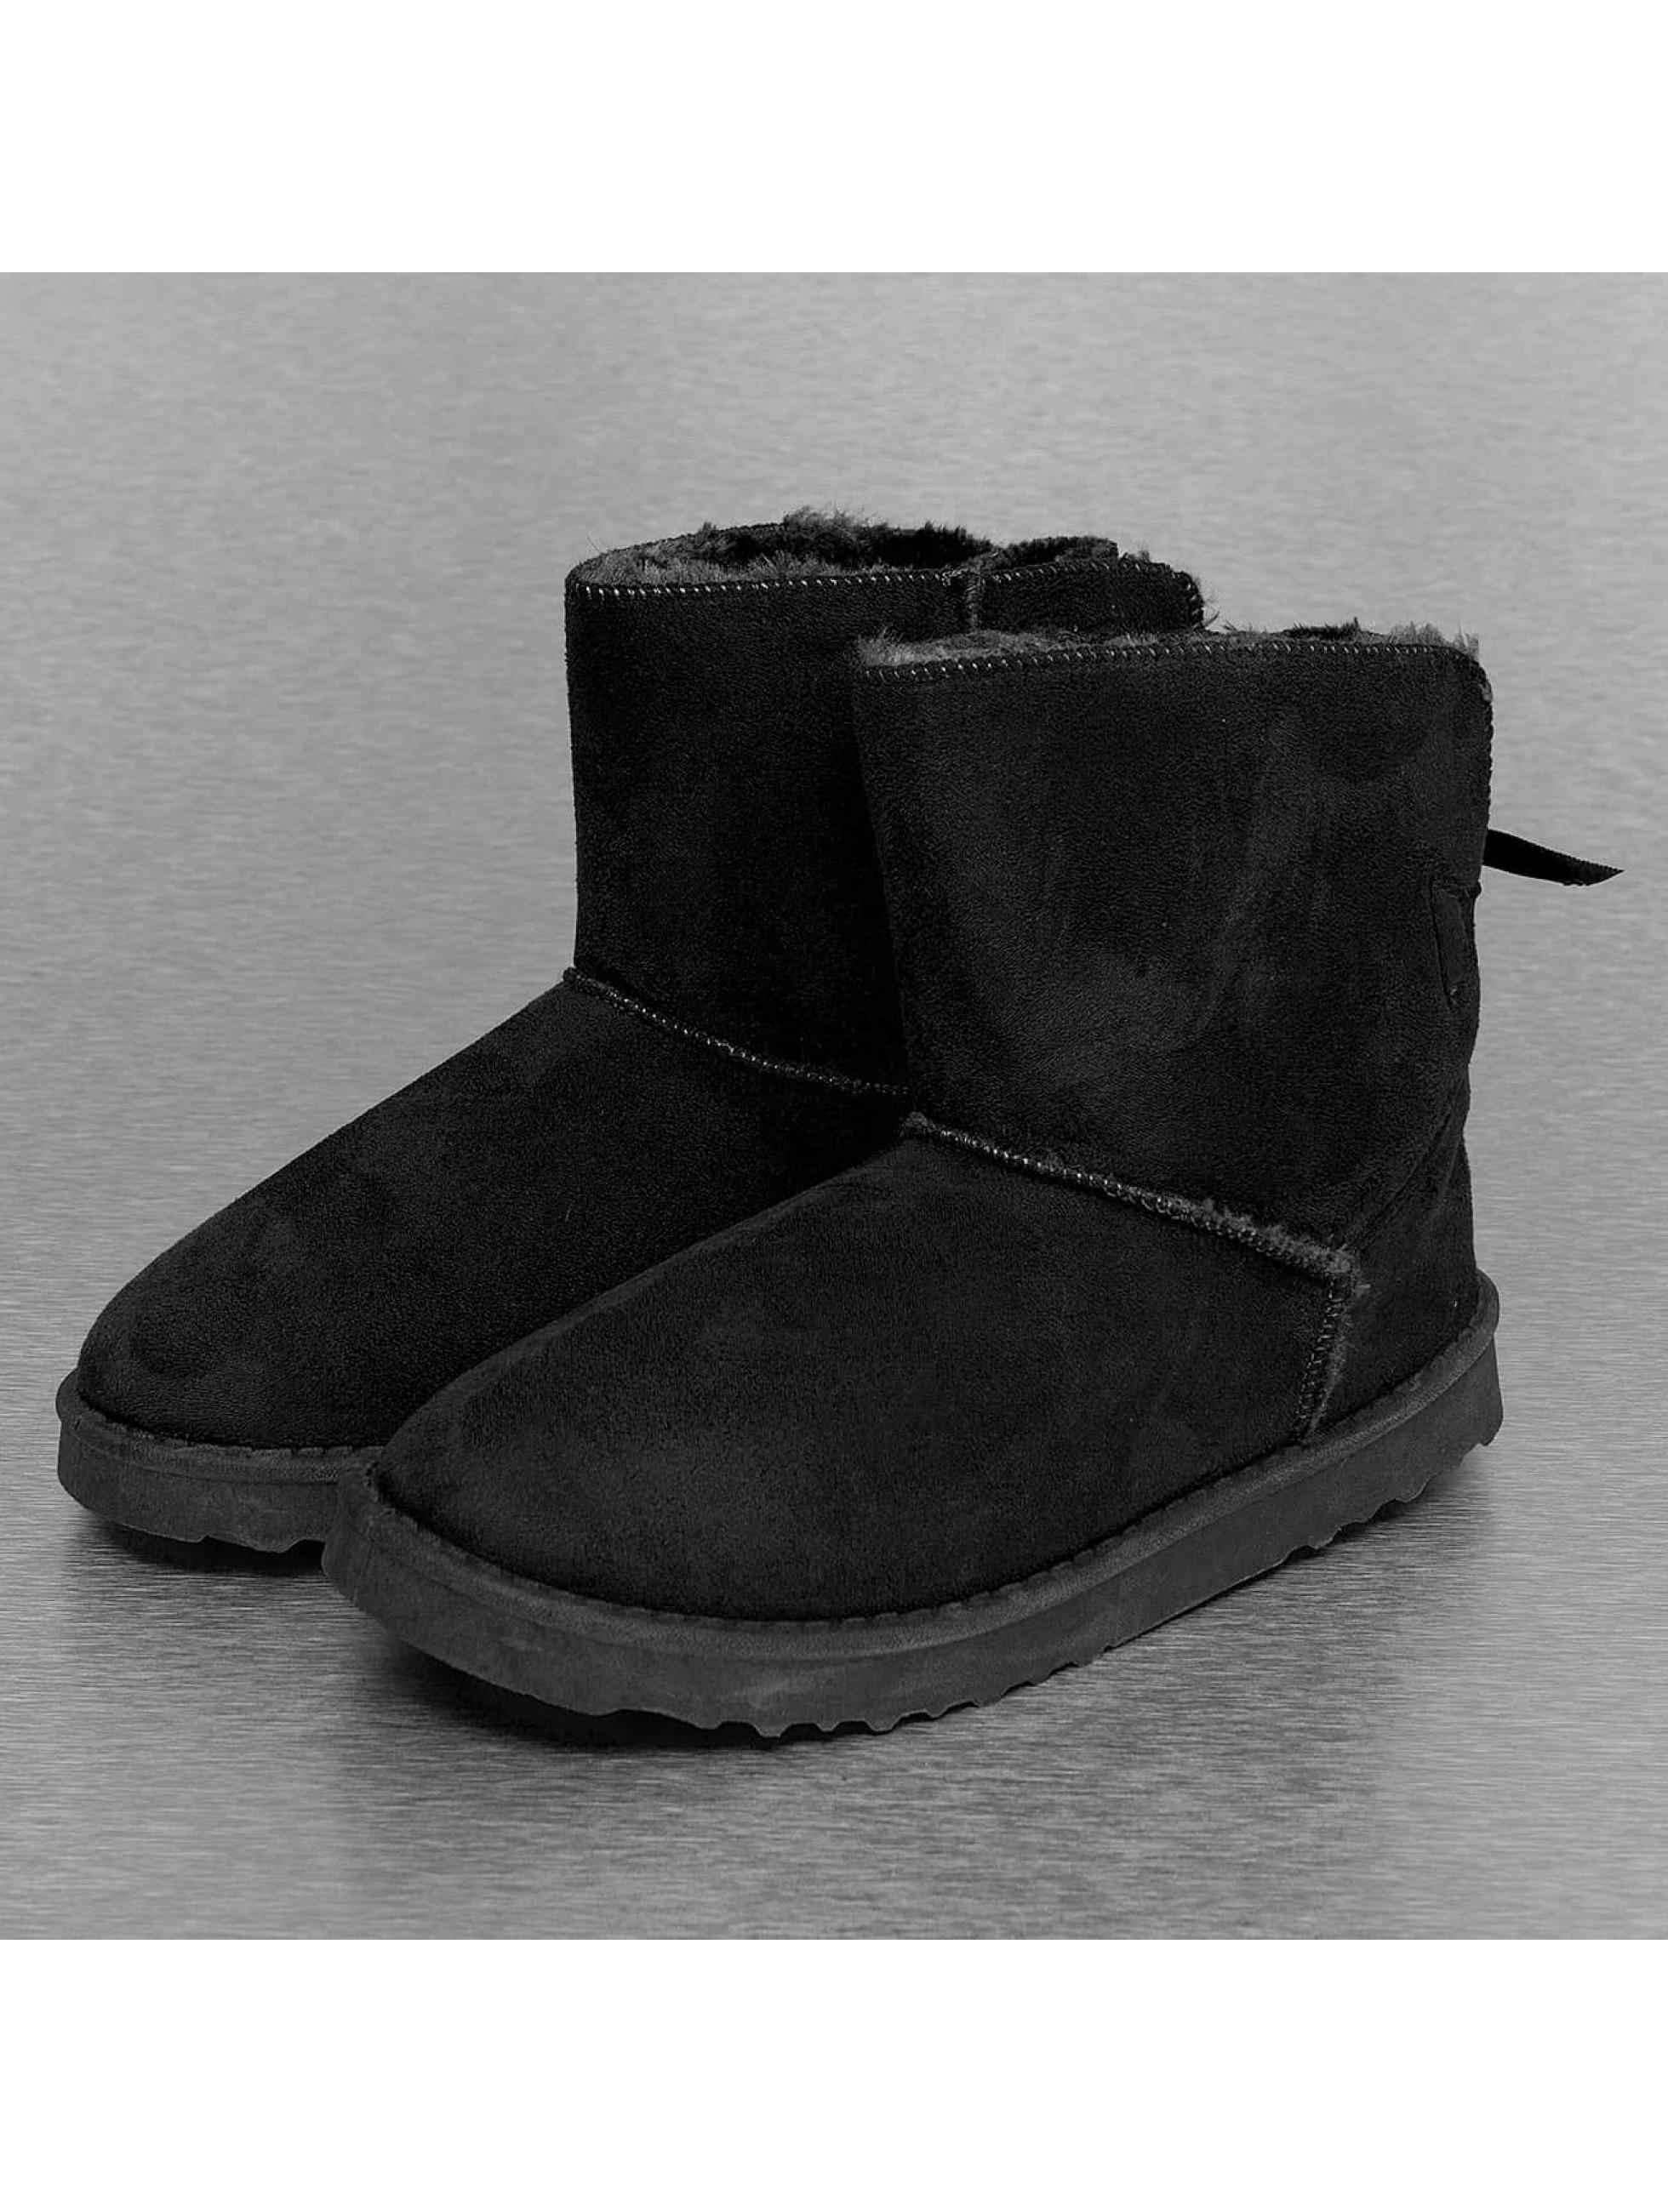 Jumex Chaussures / Chaussures montantes Basic Low en noir